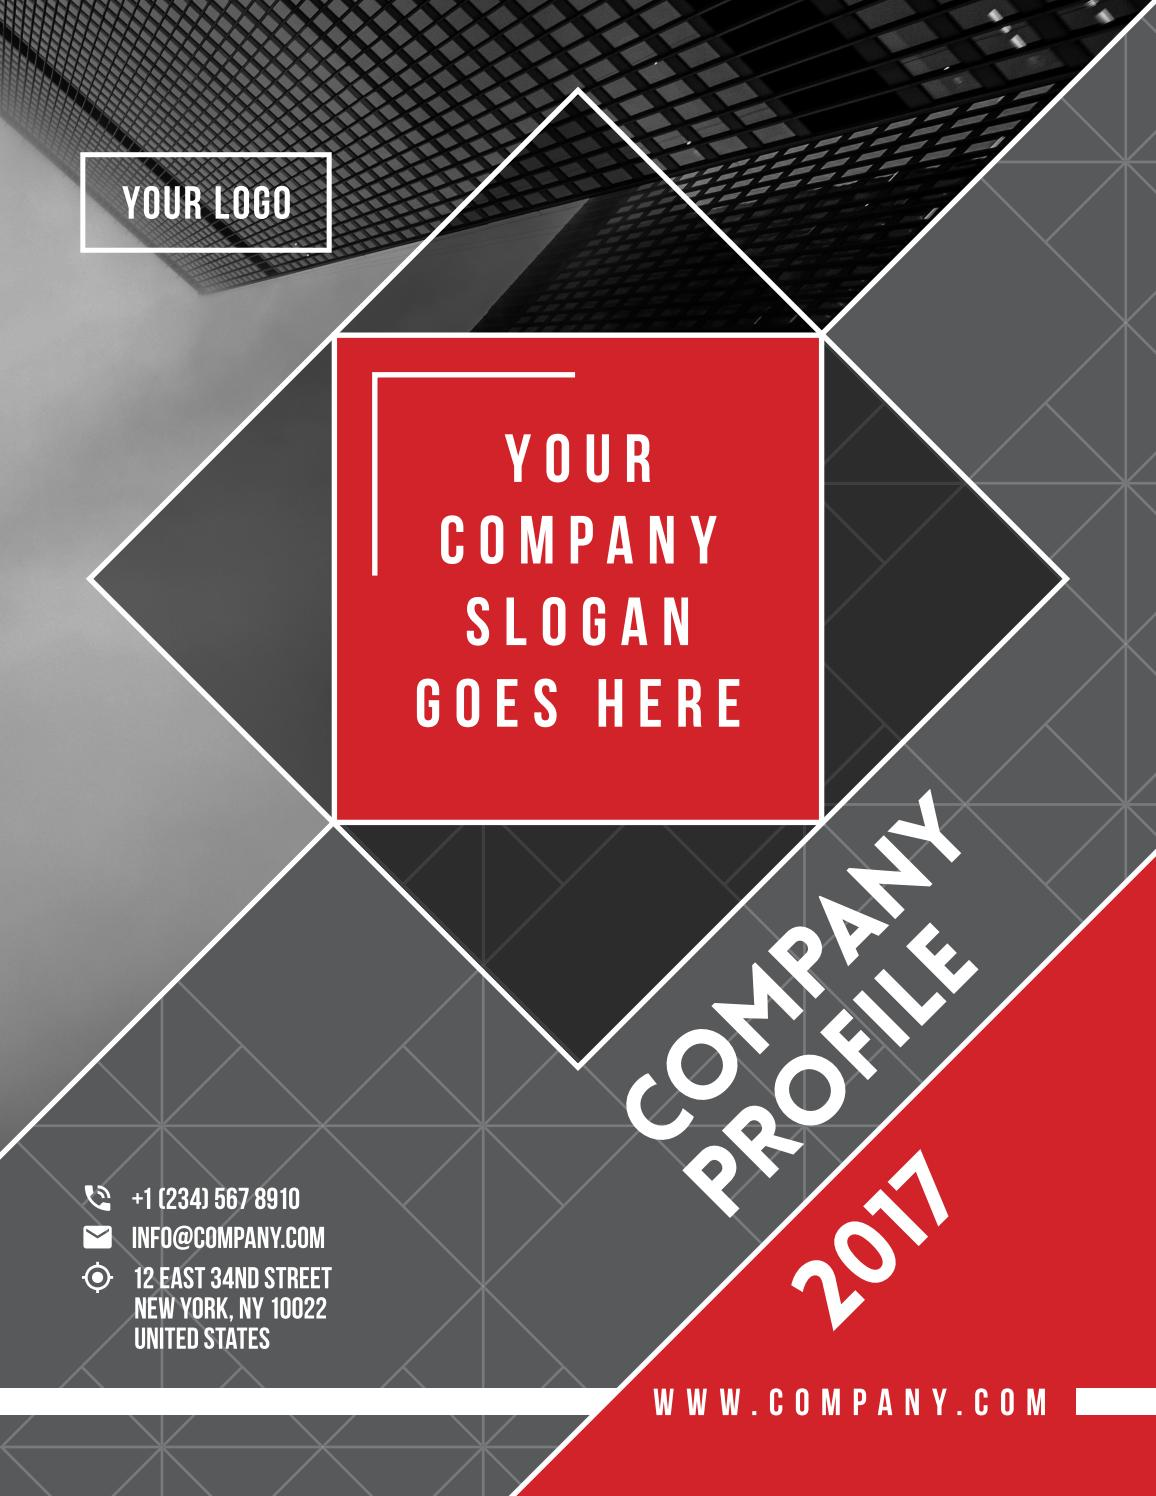 company profile - corporate brochure template by tm-team